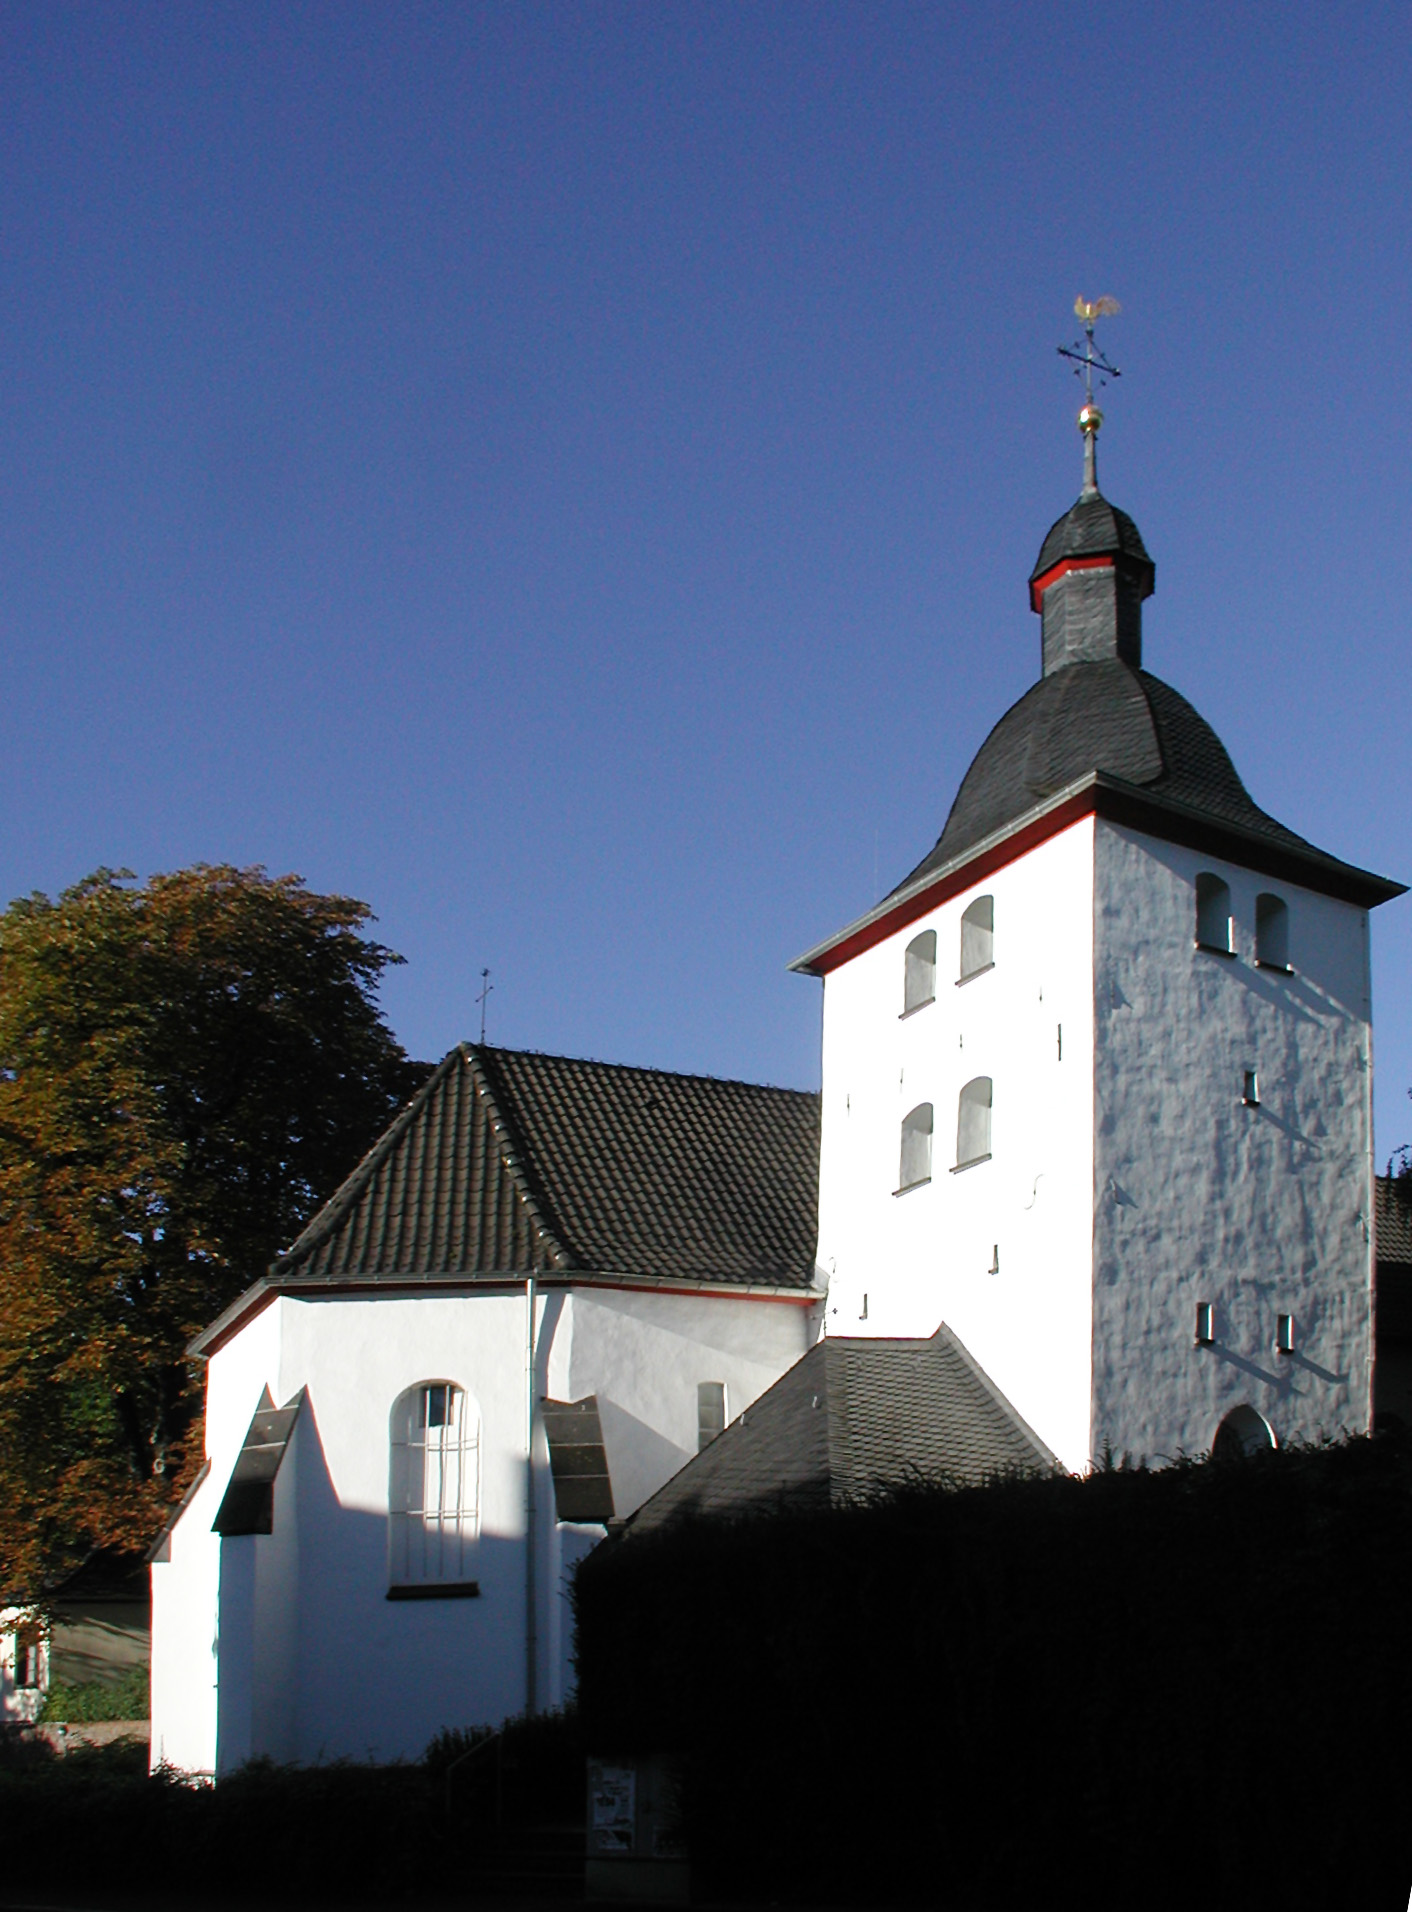 File:Alt-Huerth-PA200002.JPG - Wikimedia Commons